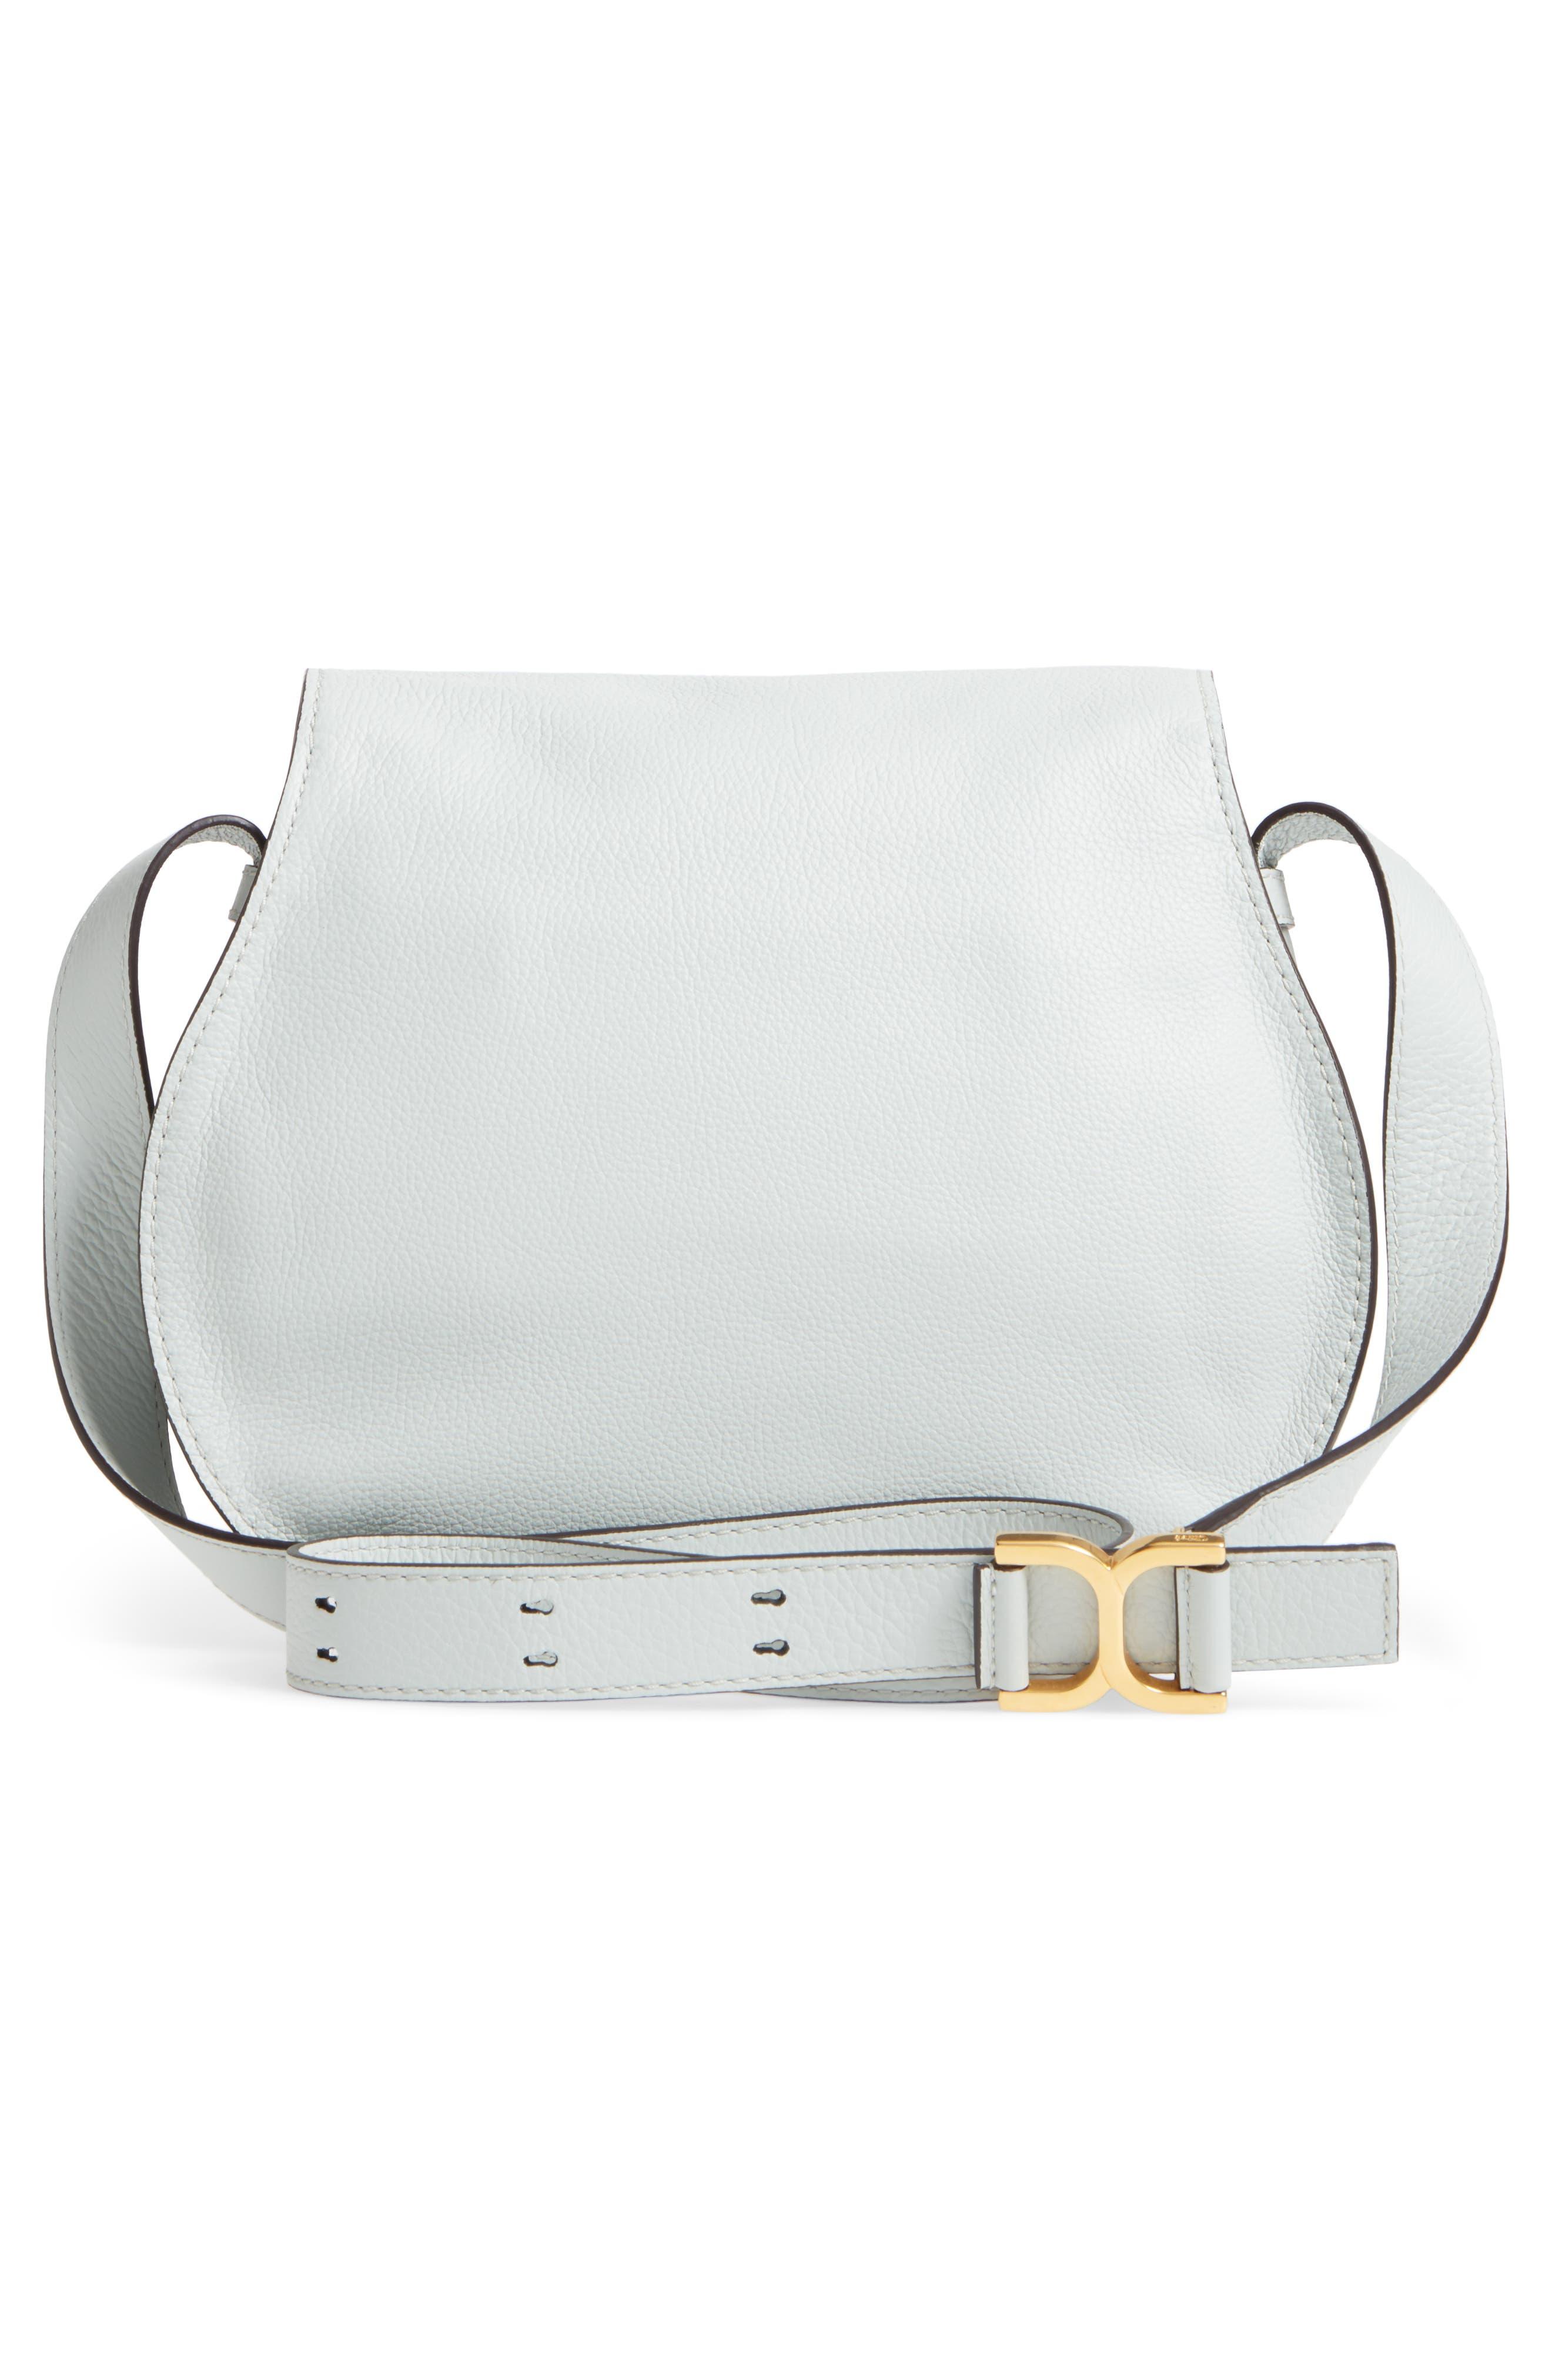 Alternate Image 3  - Chloé 'Marcie - Medium' Leather Crossbody Bag